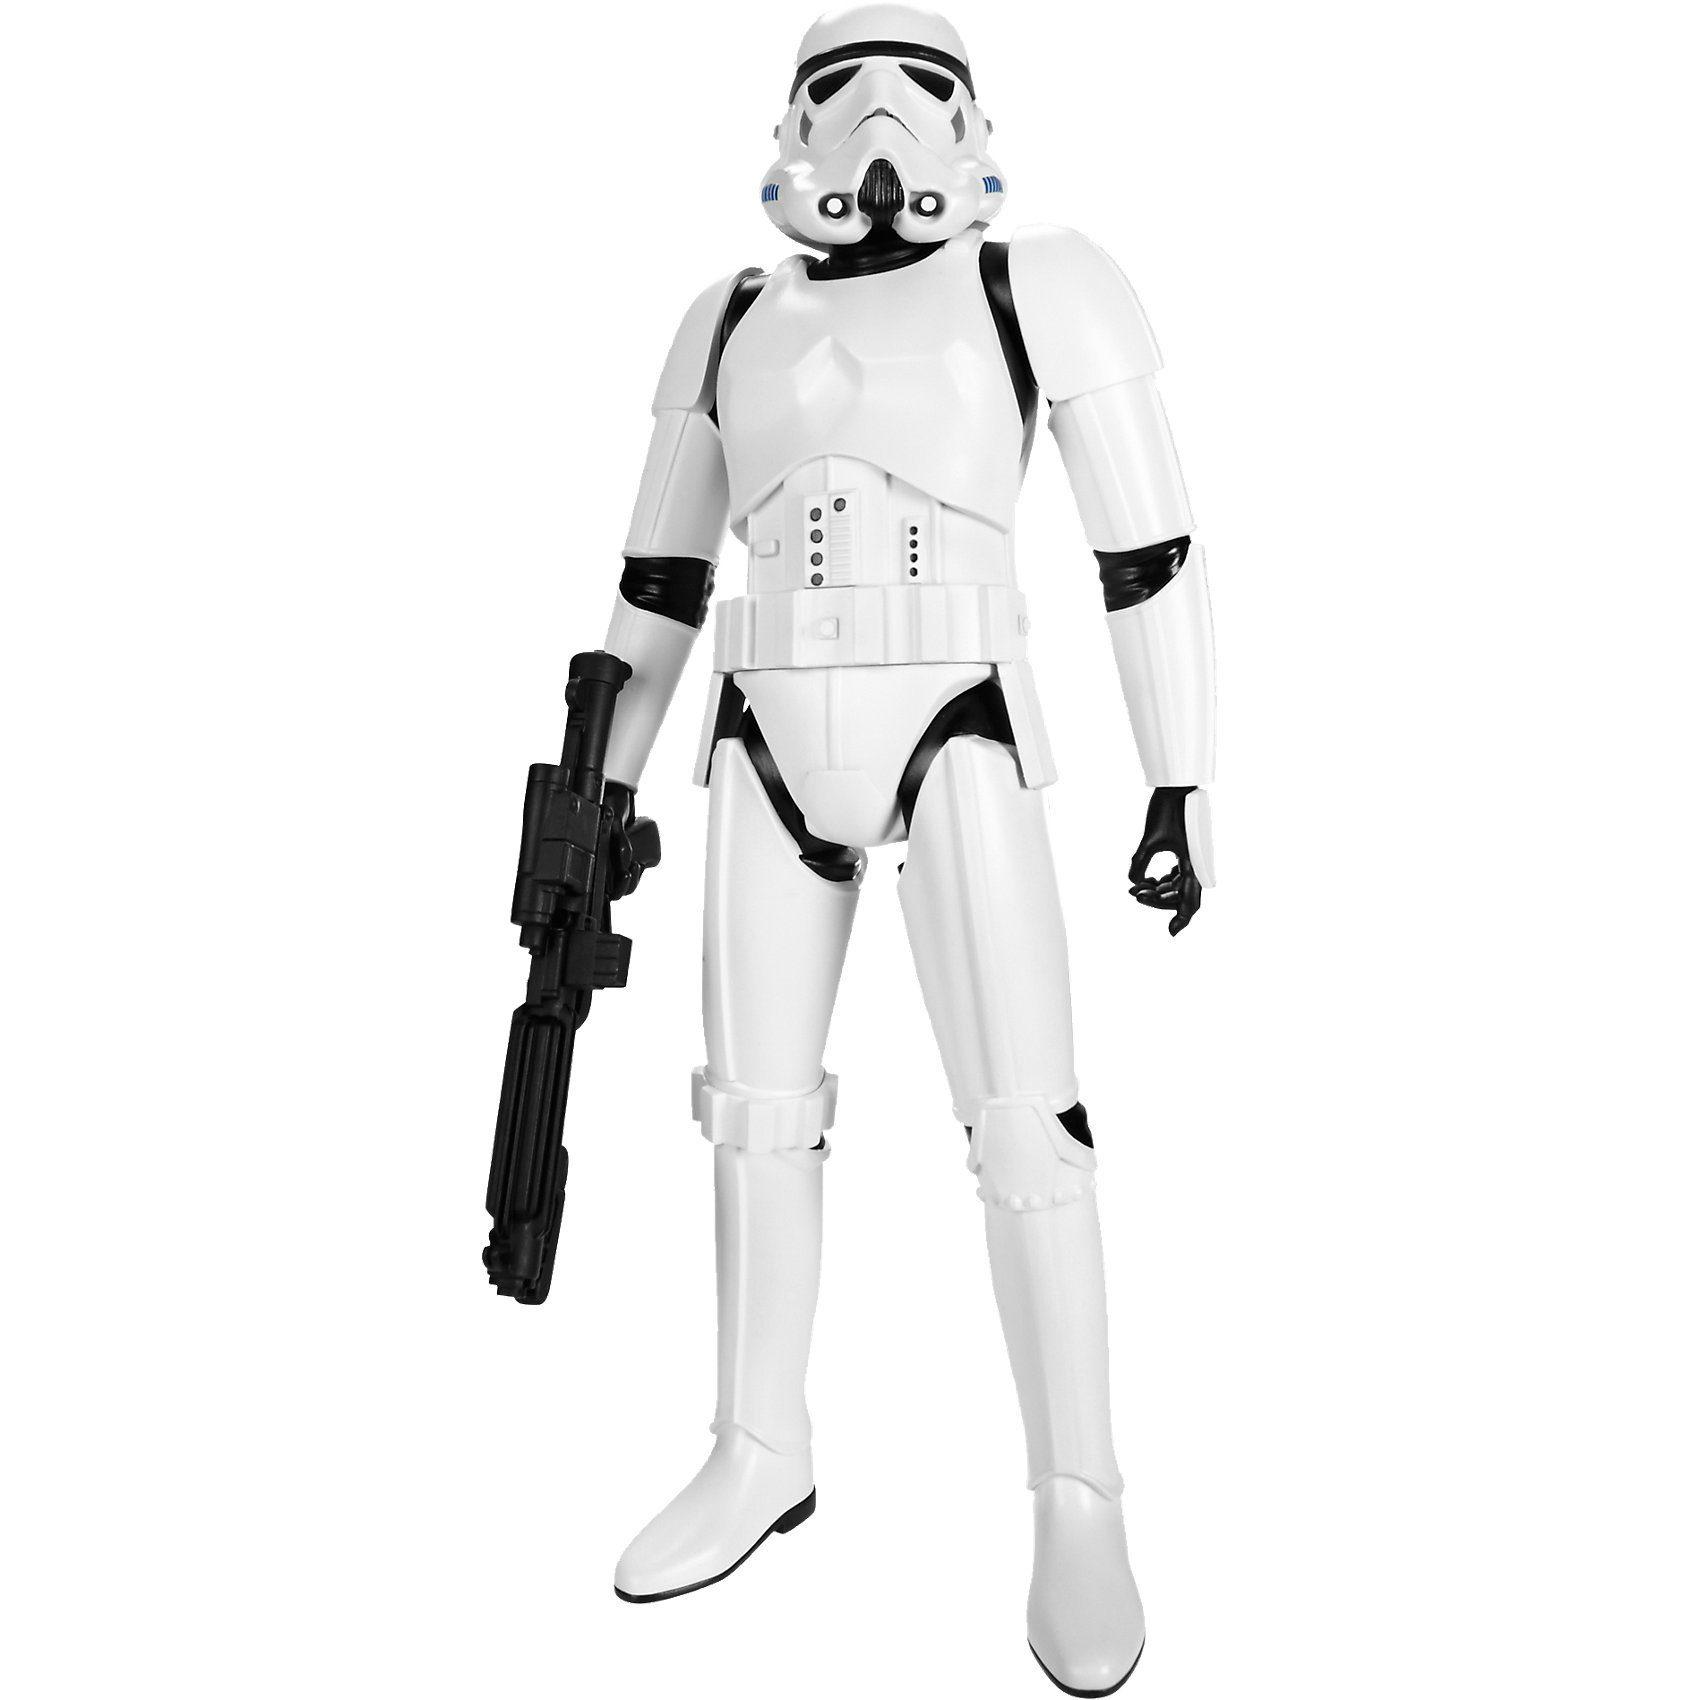 Jakks Pacific Star Wars Rogue one - Big Figs - Imperial Stormtrooper, 50 c